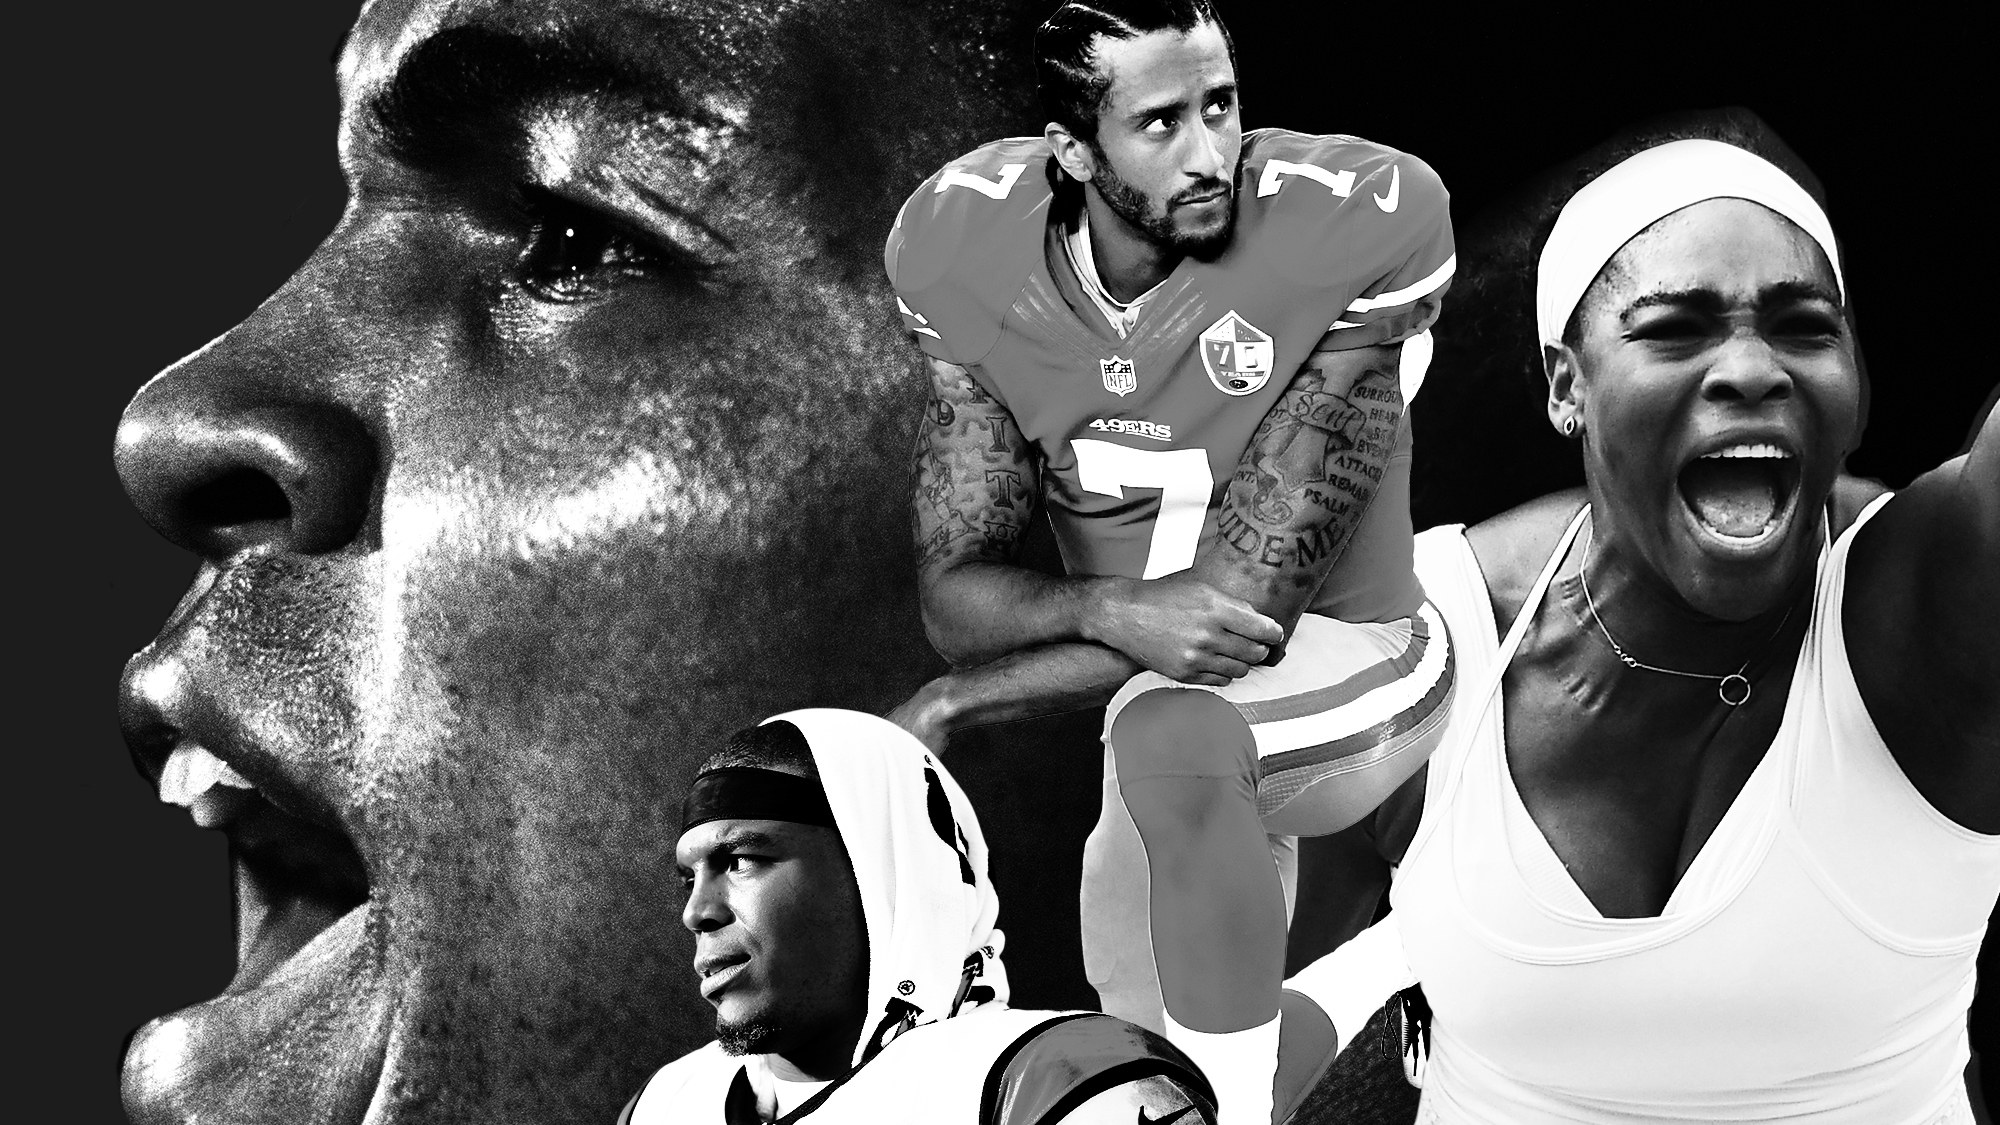 black-athletes-matter-3x2